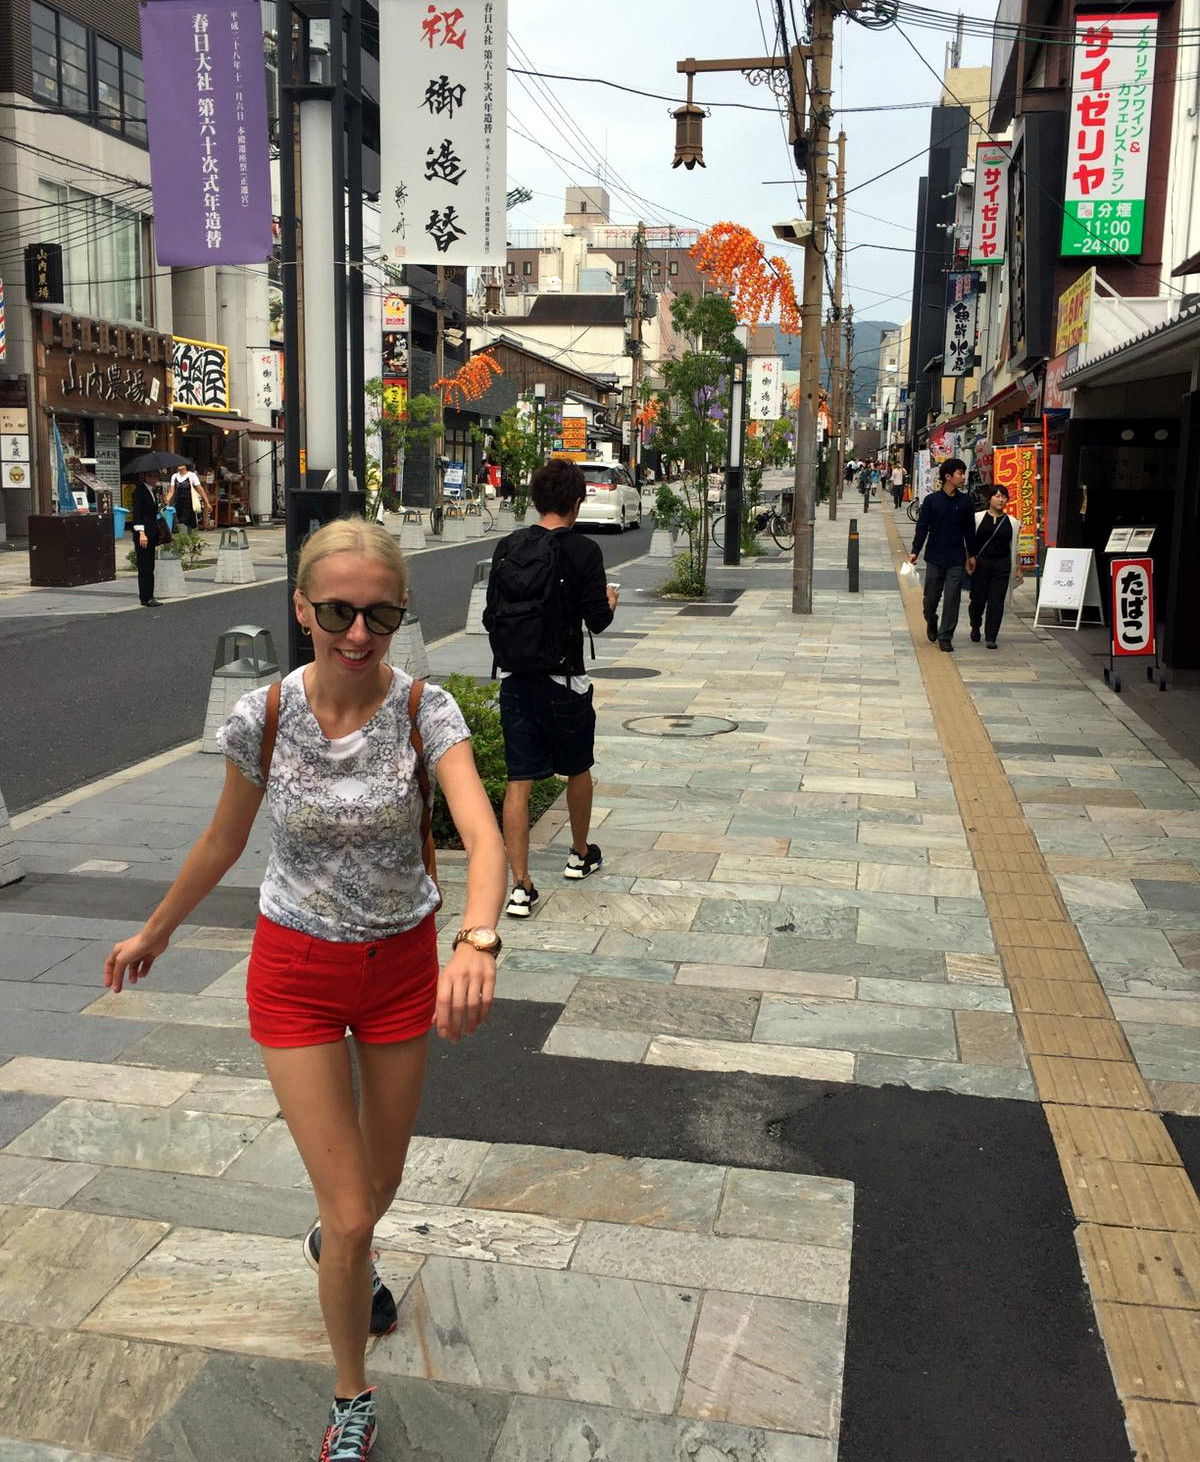 japonia nara miasto ulice iglawpodrozy